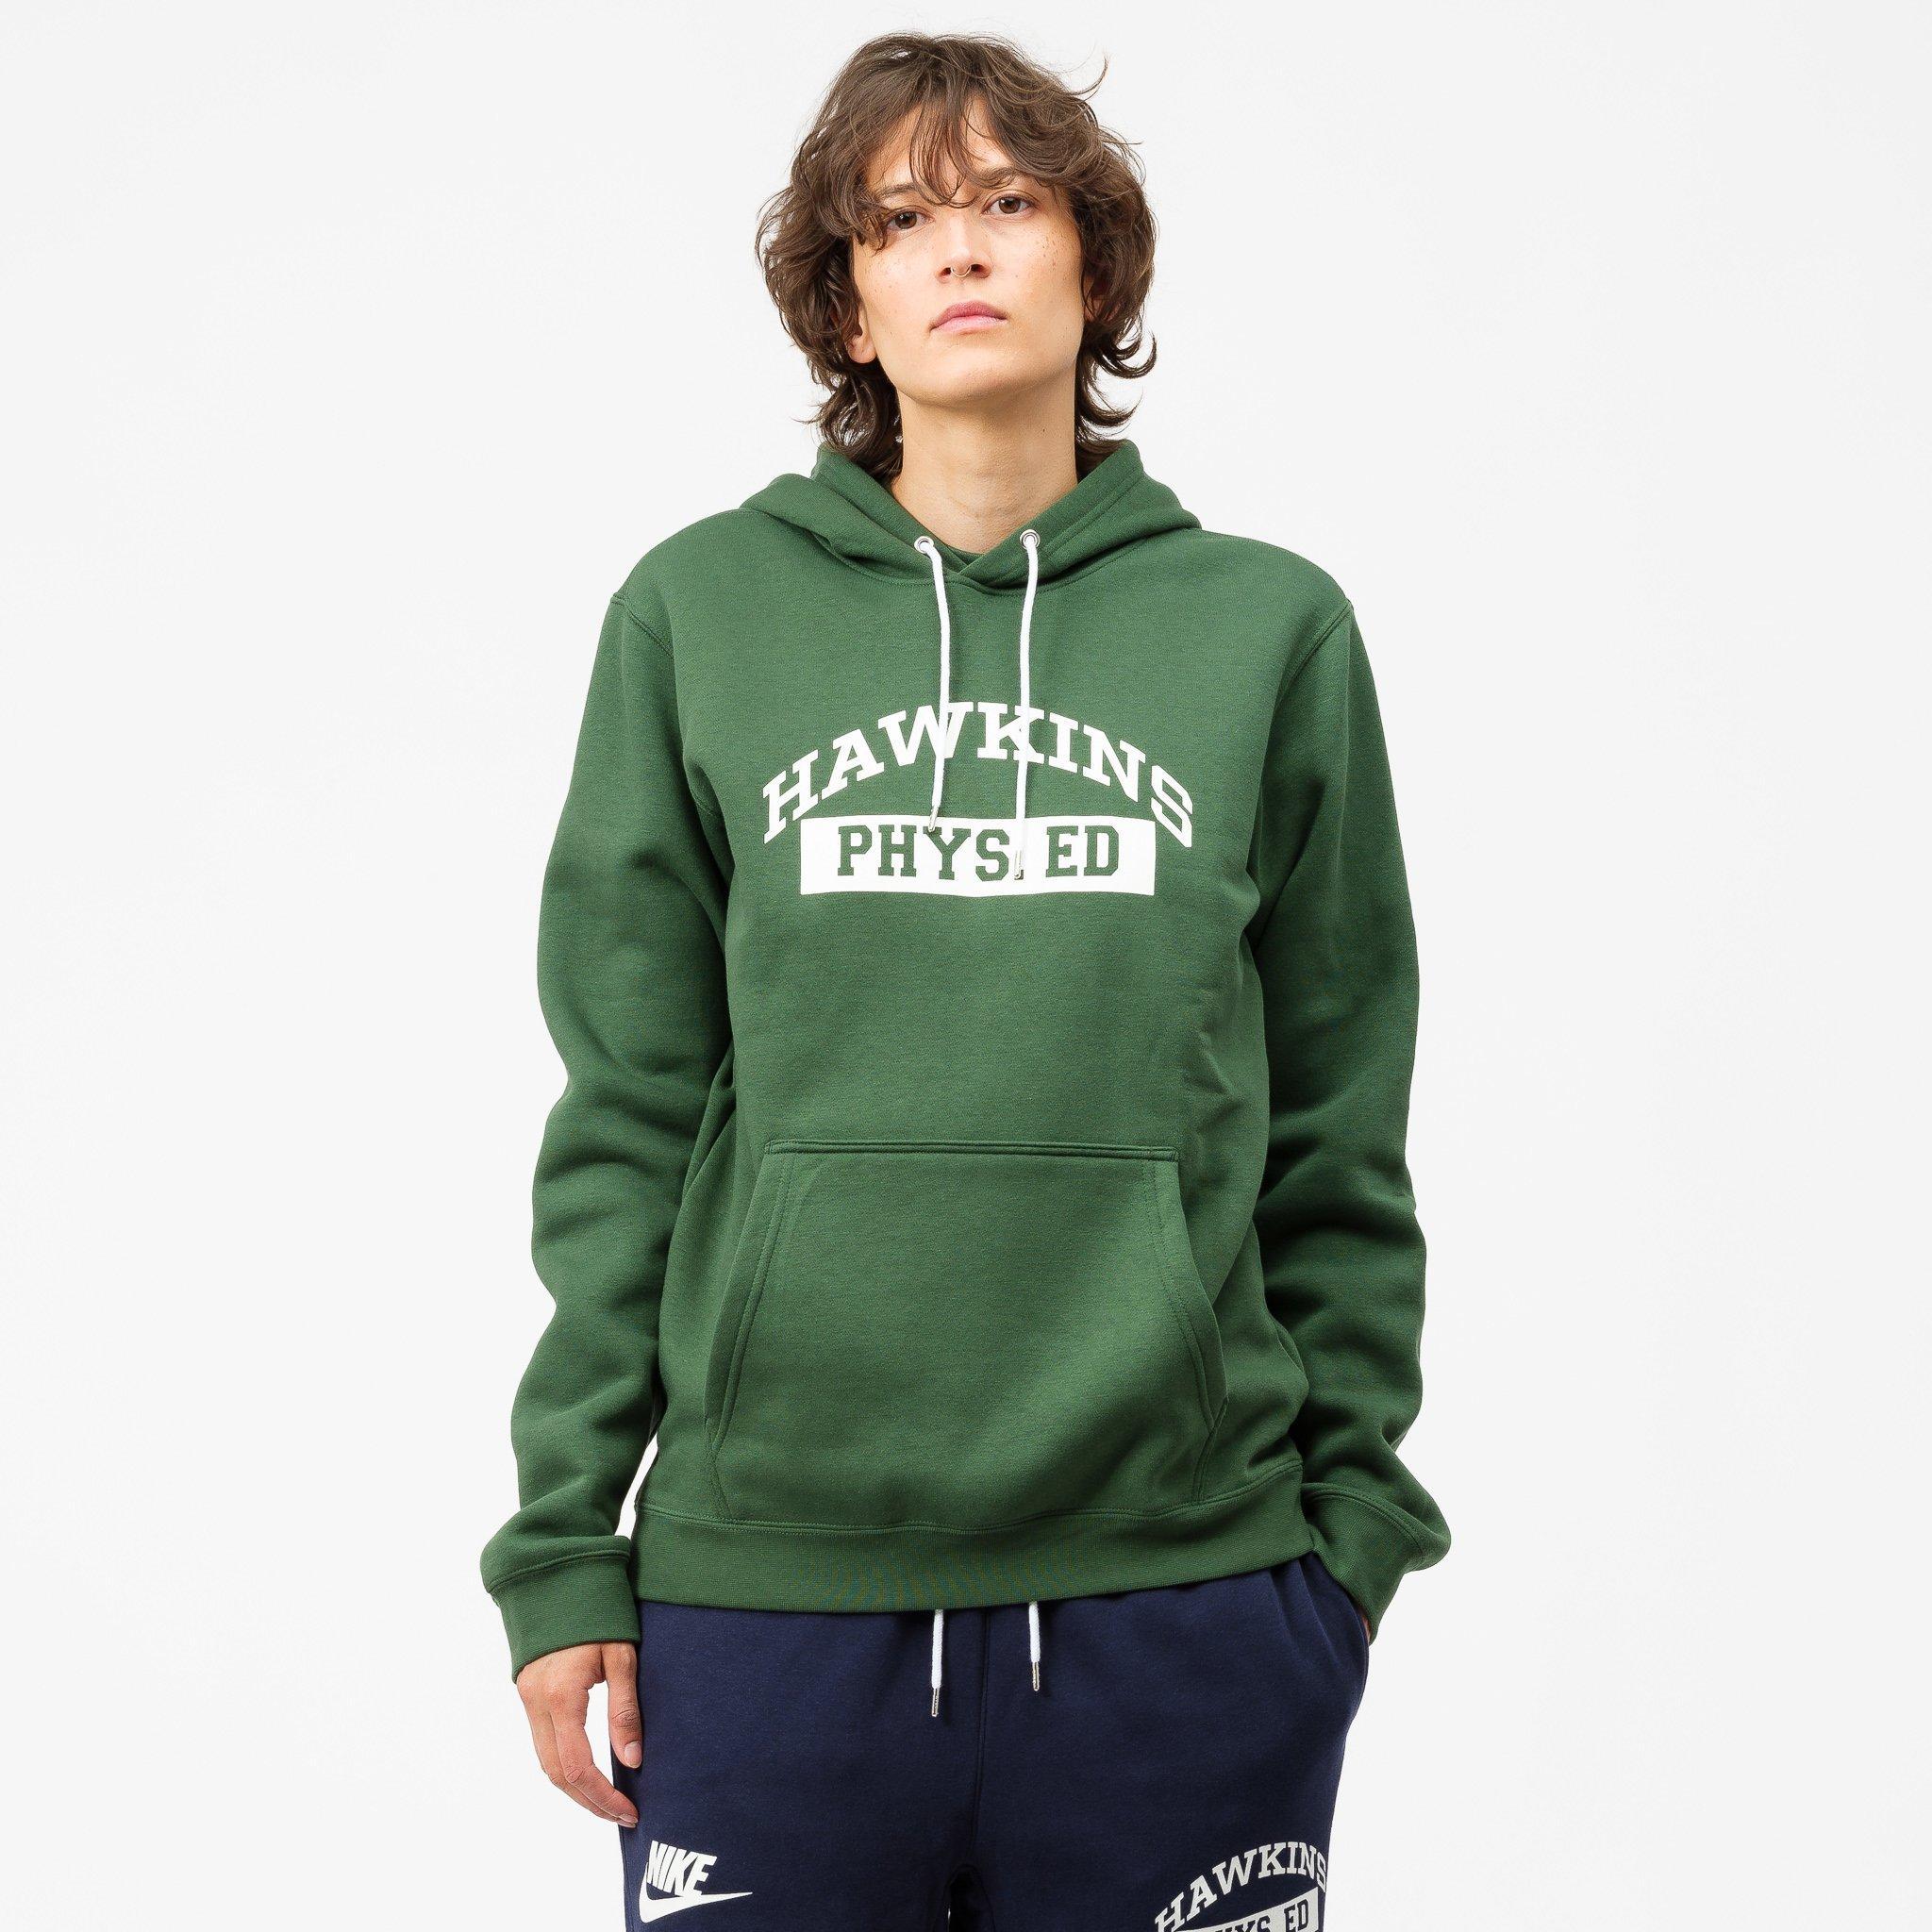 Nike Cotton X Stranger Things Hoody in